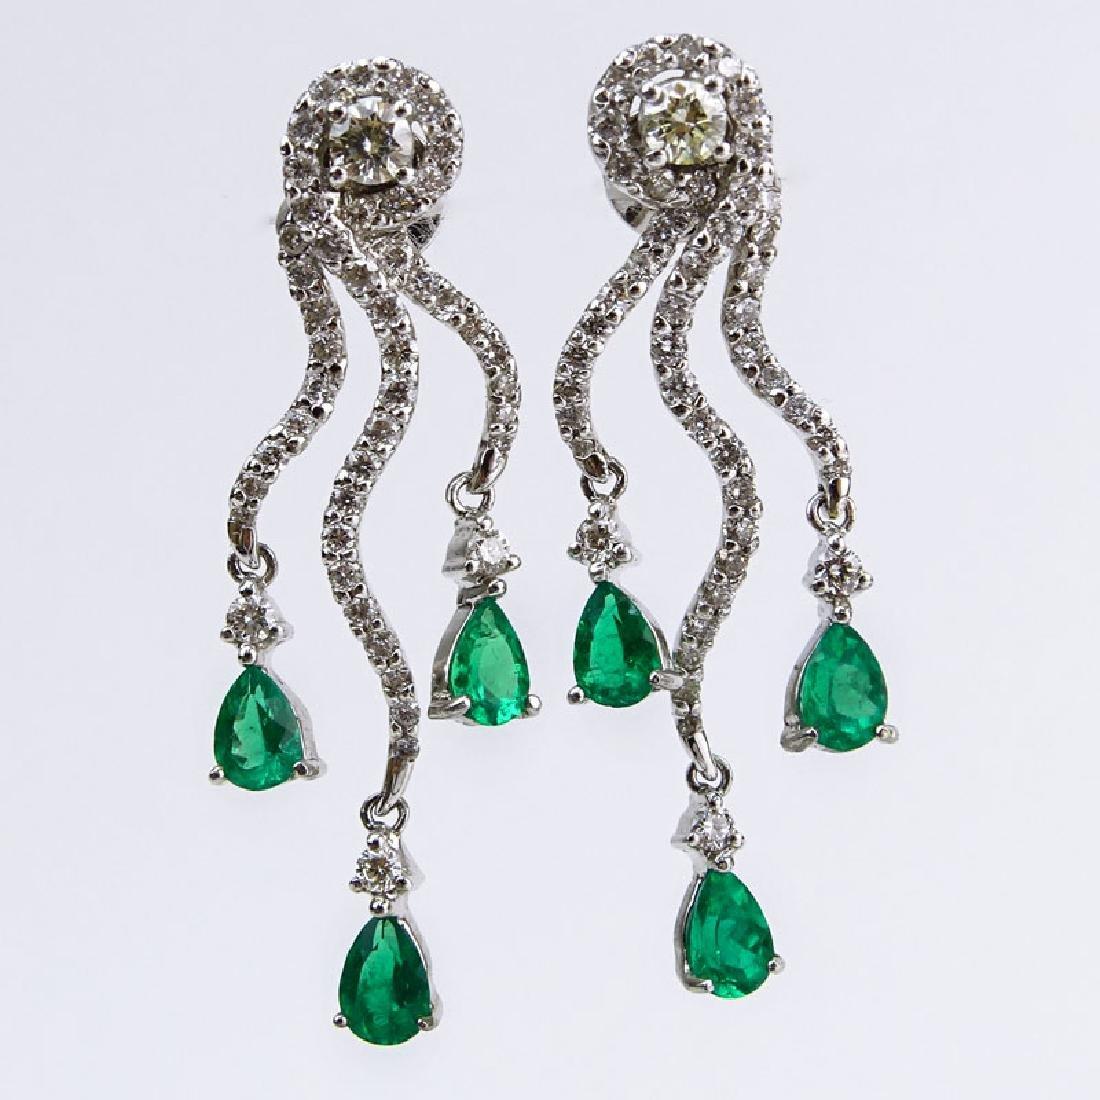 Approx. 1.80 Carat Pear Shape Emerald, 1.60 Carat Round